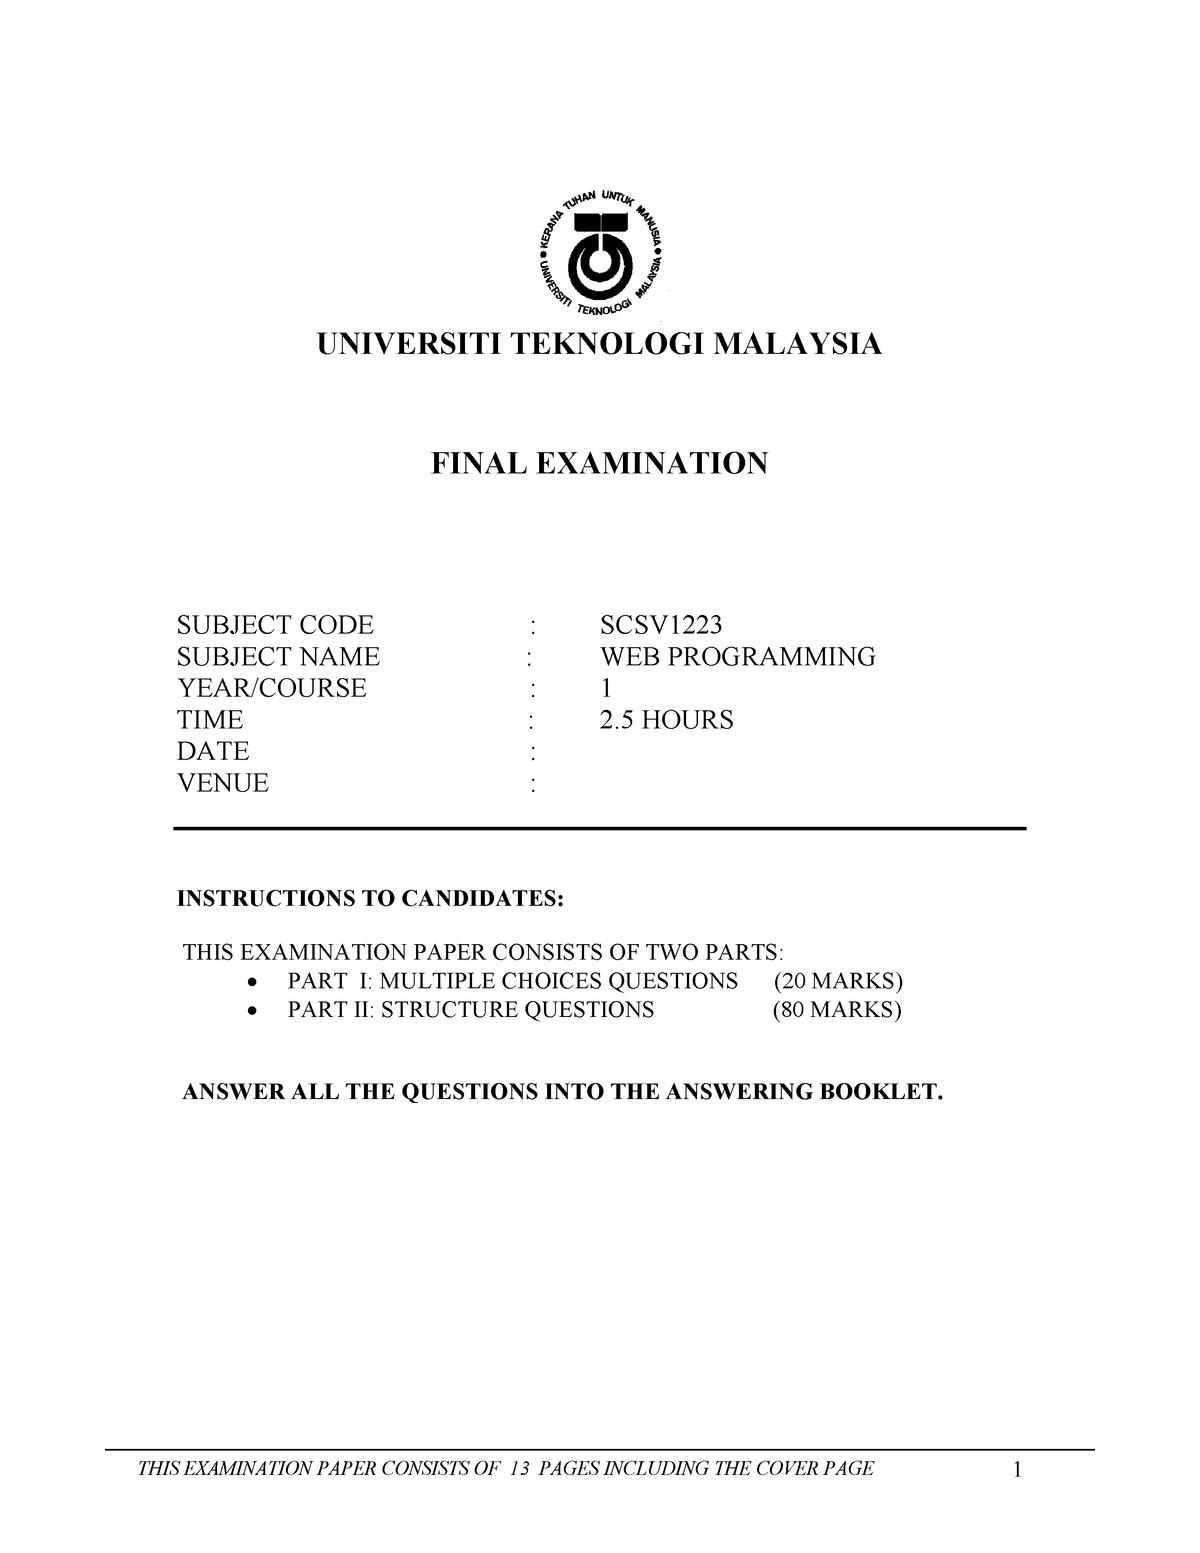 WEBPROG Final Exam Question - Web Programming SCSV 1223